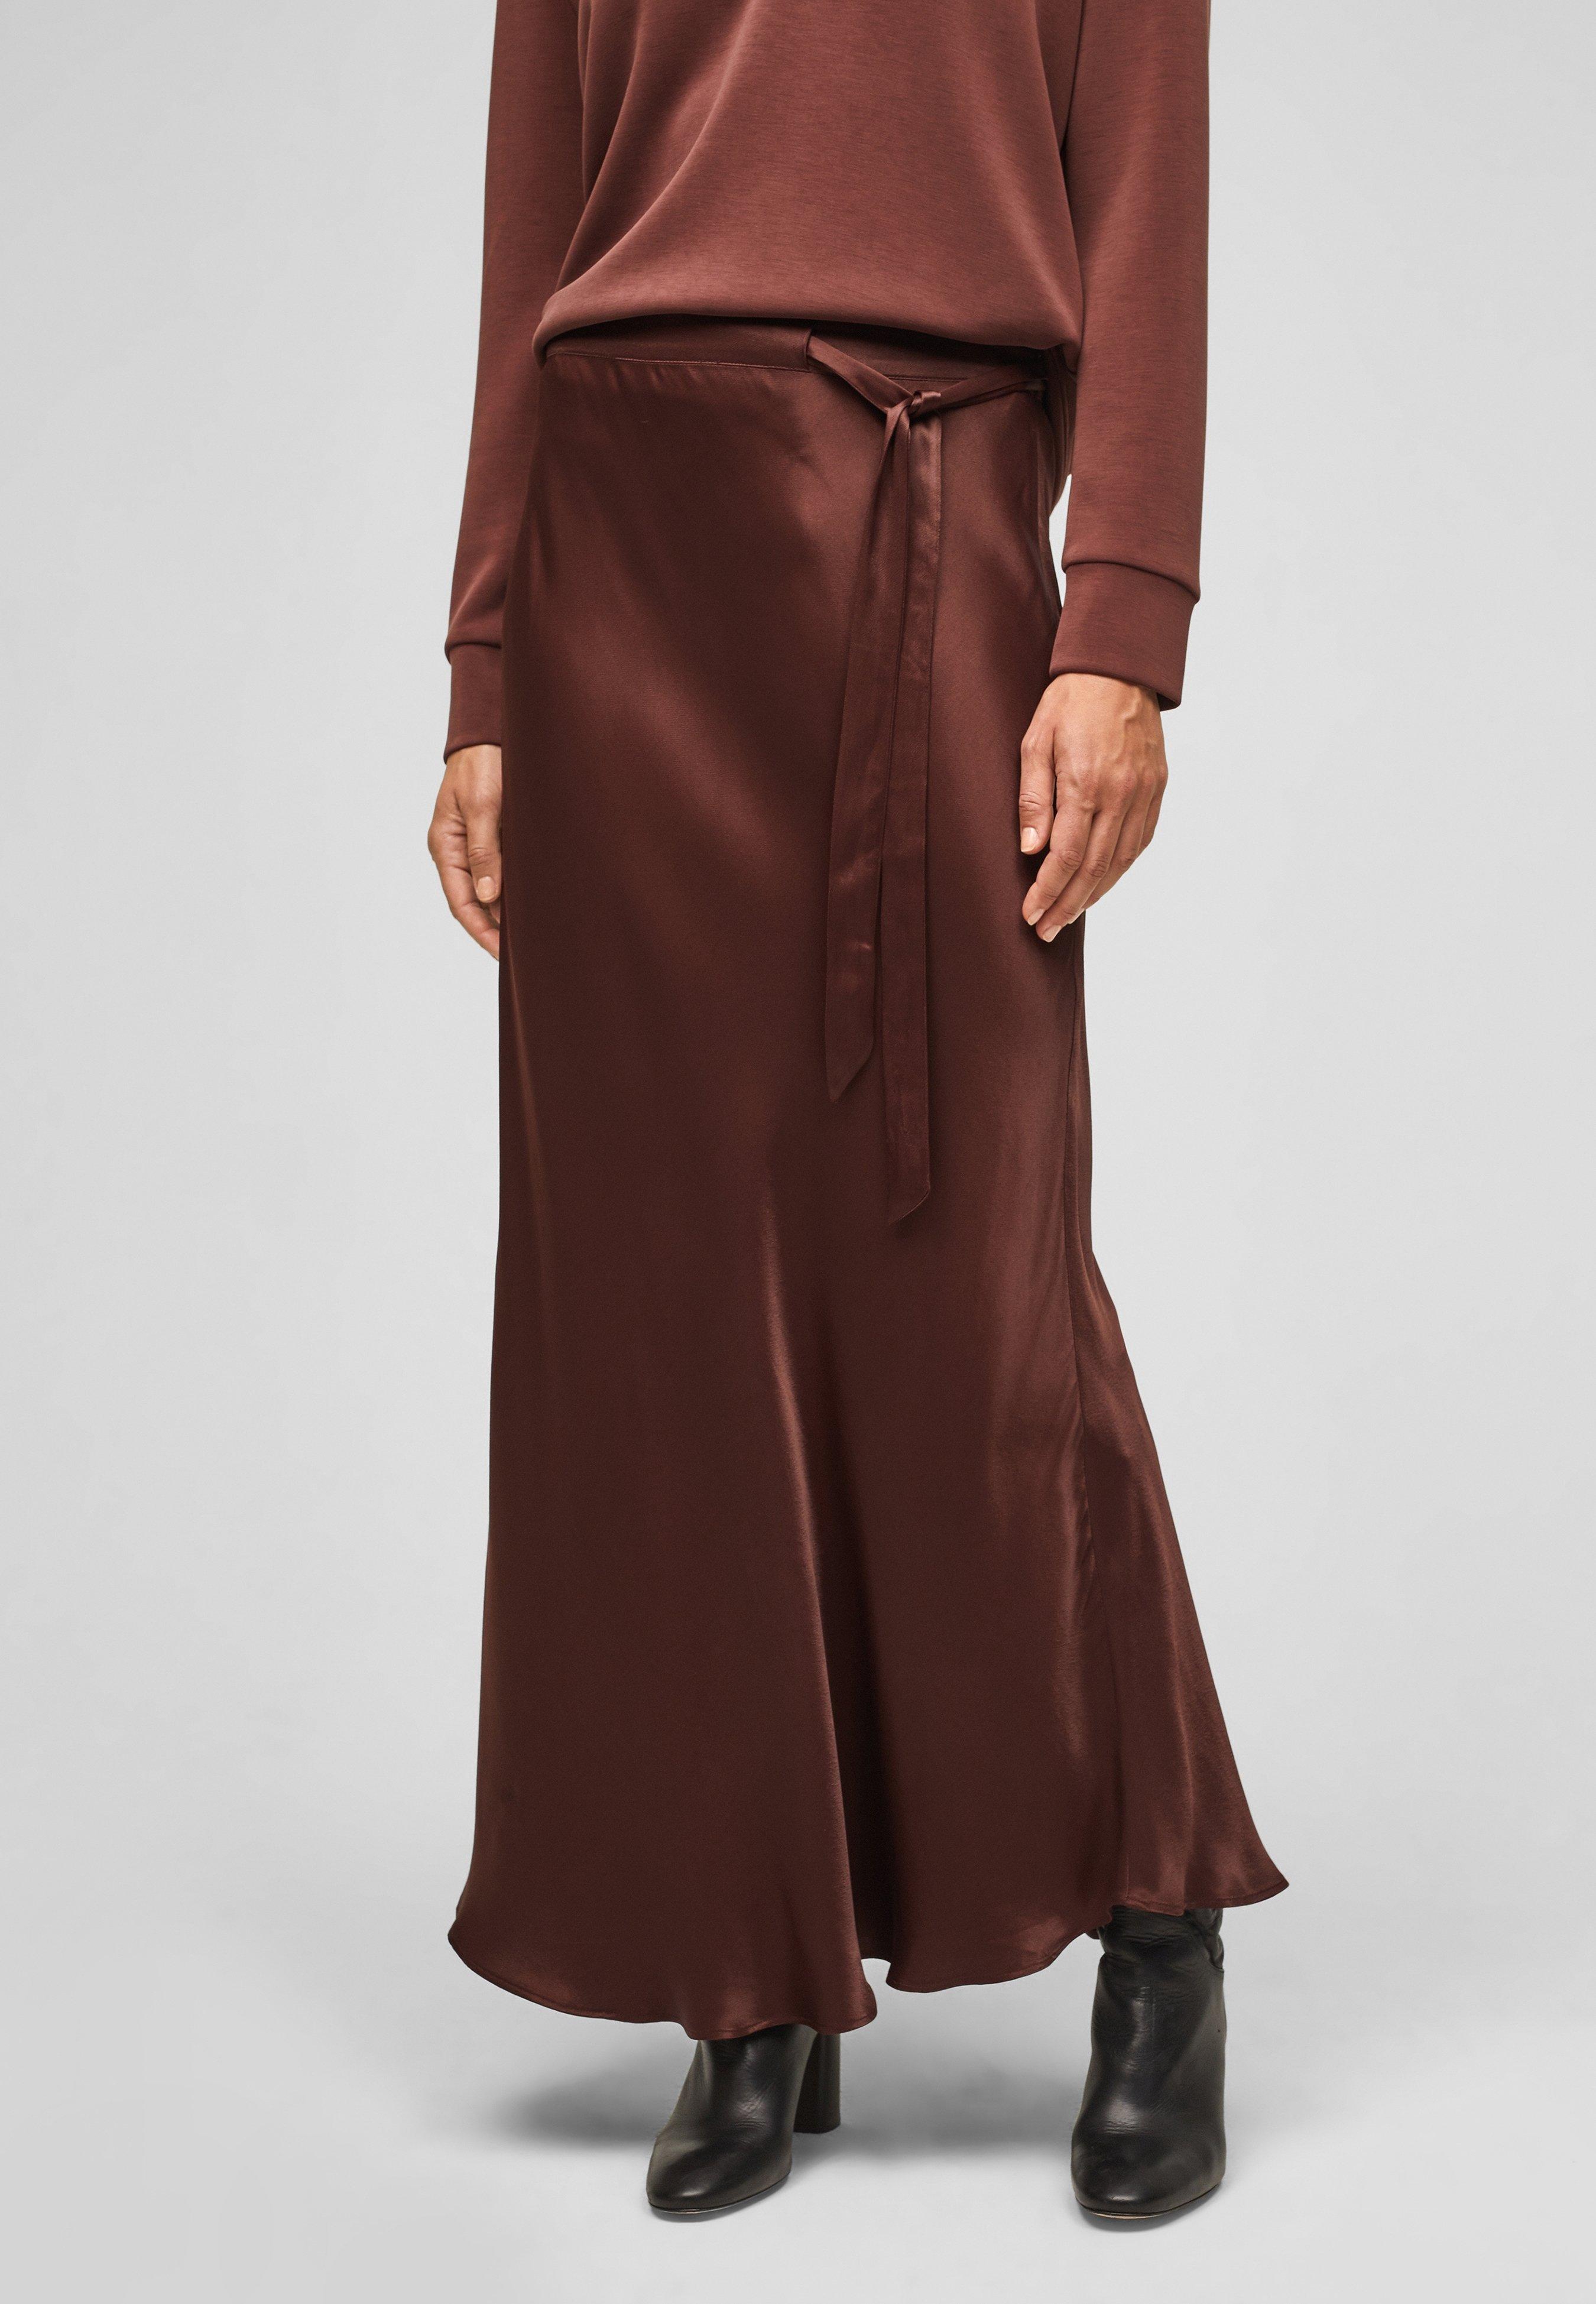 Femme JUPE - Jupe longue